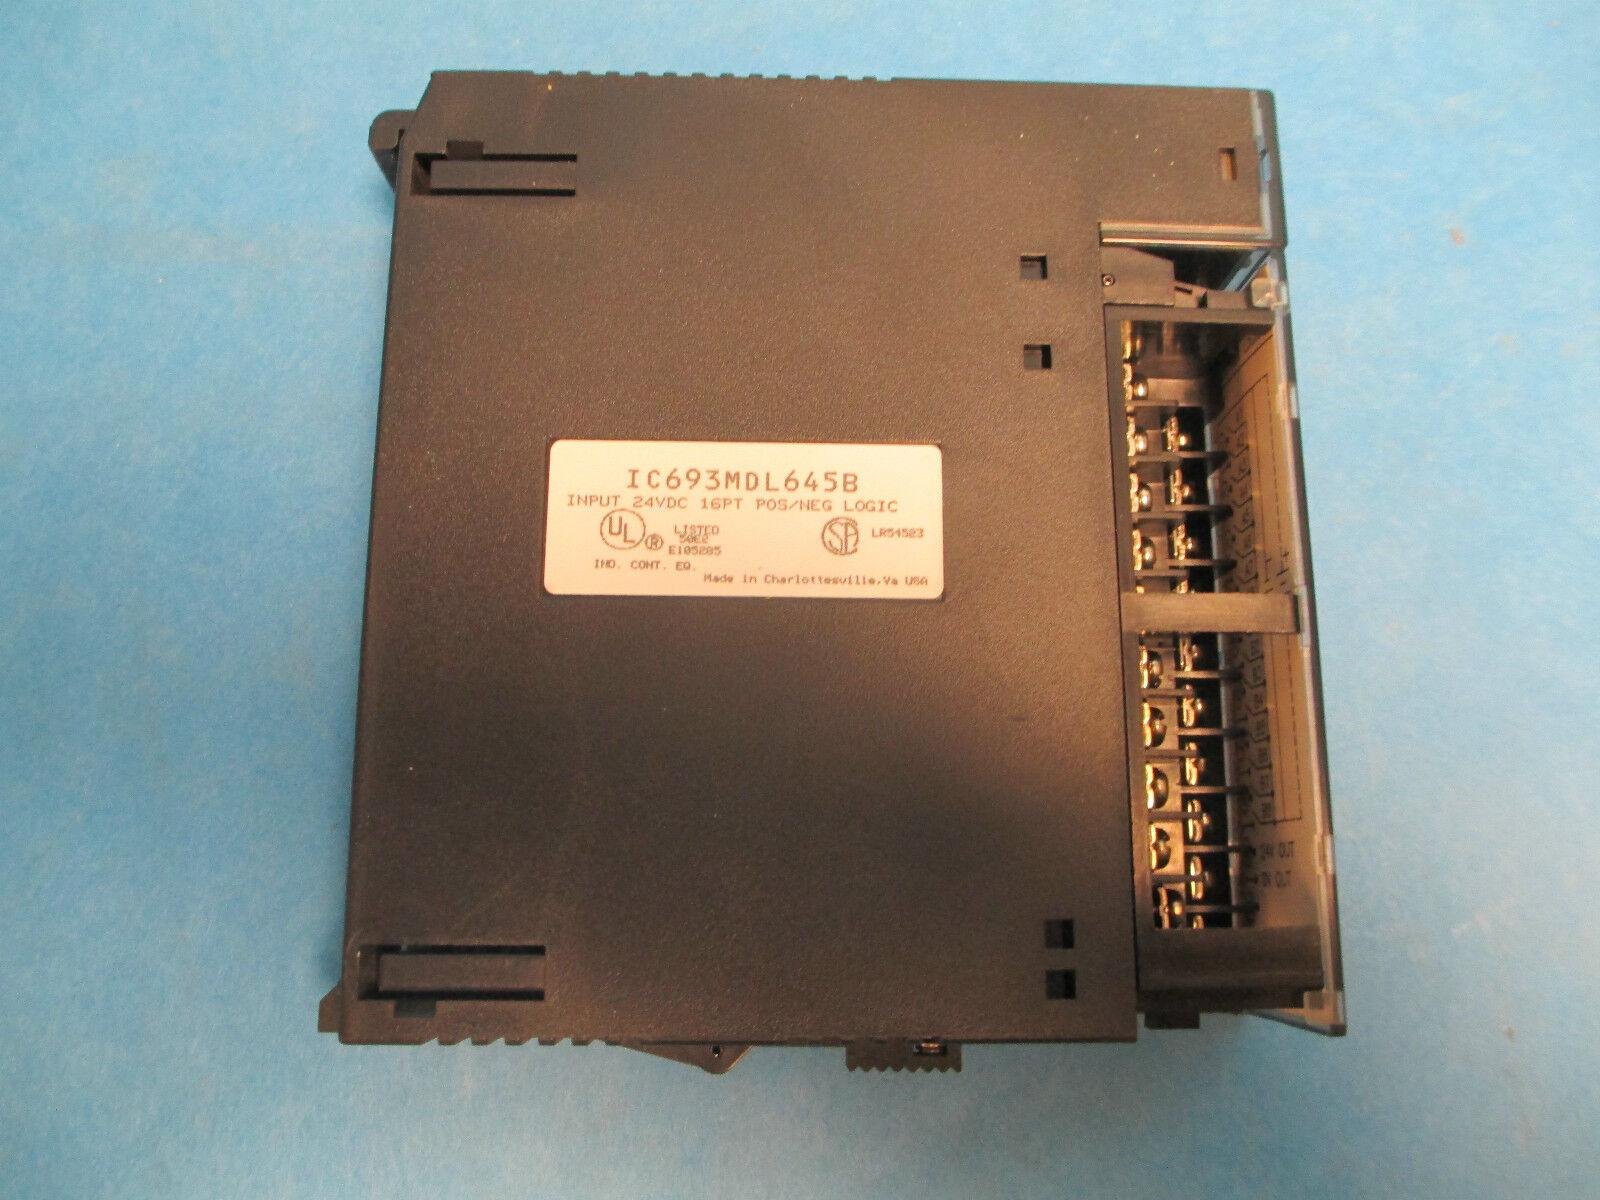 GE Fanuc Input Module IC693MDL645B, 24V 16PT Used